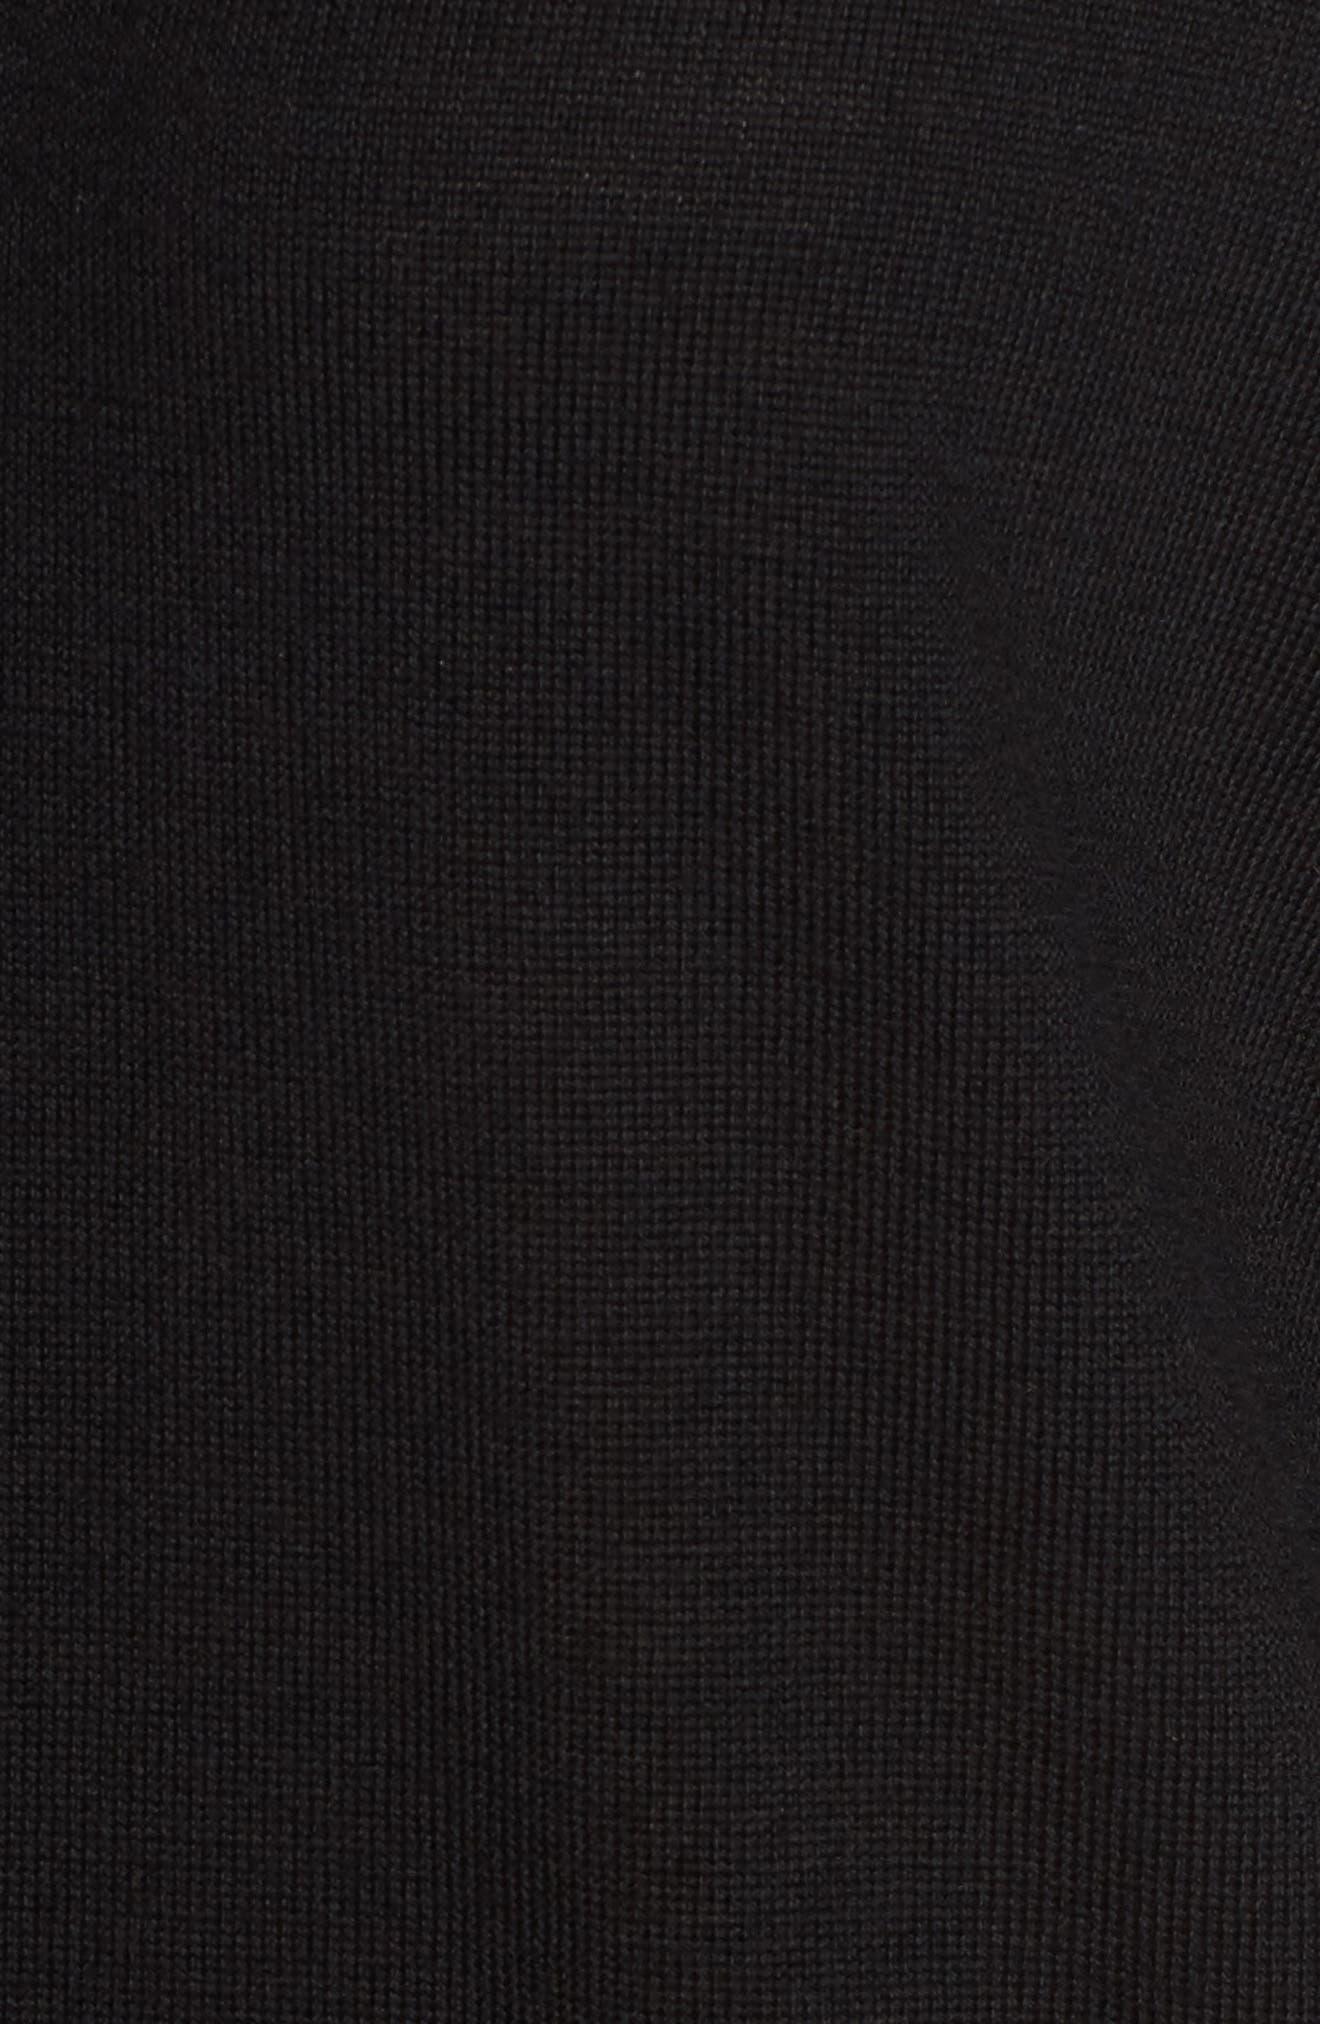 Metallic Trim Merino Wool Blend Sweater,                             Alternate thumbnail 5, color,